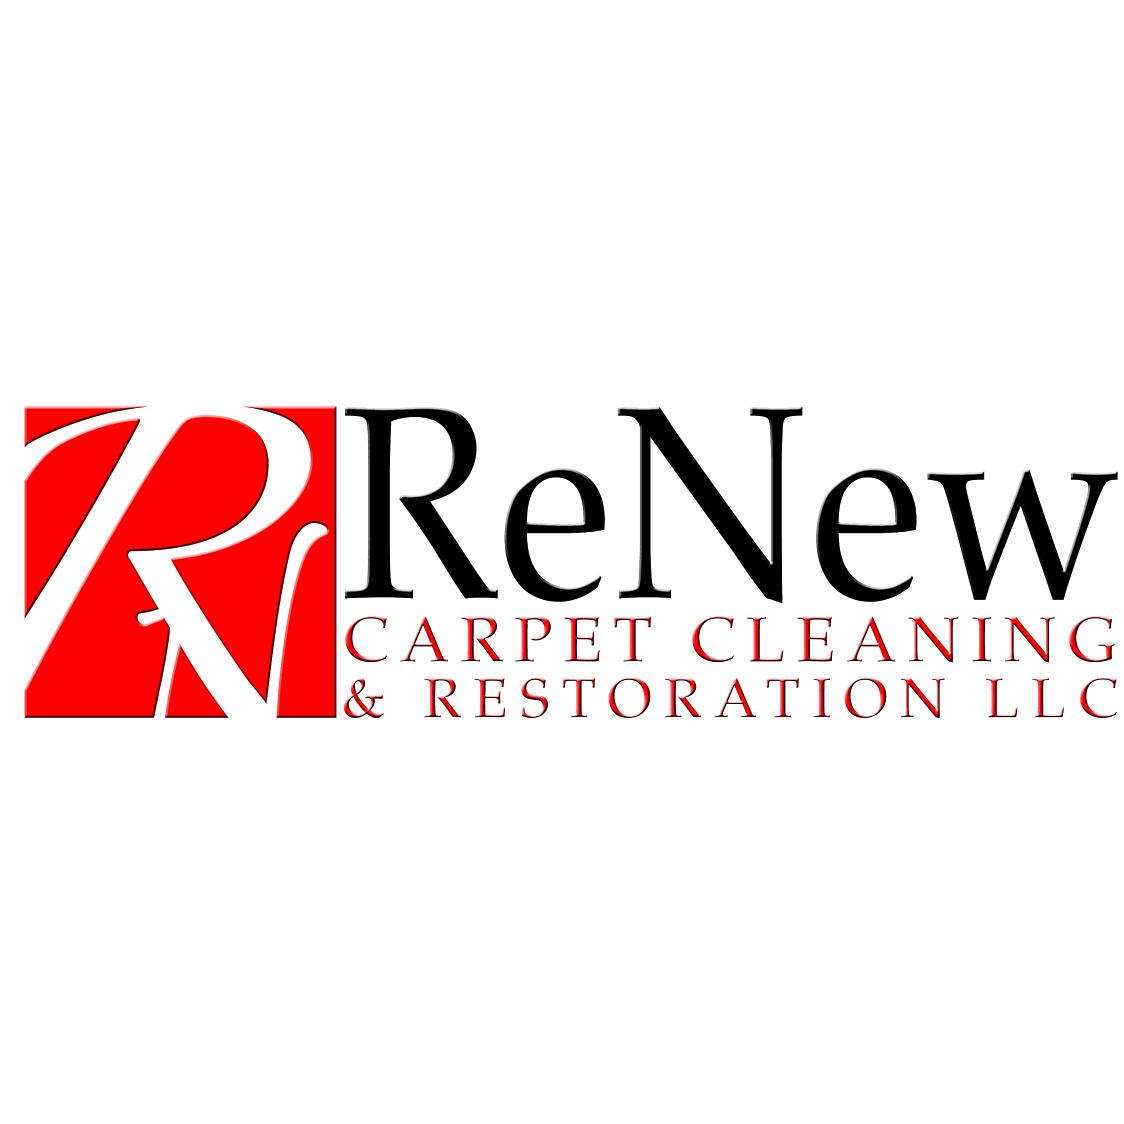 Renew Carpet Cleaning & Restoration LLC